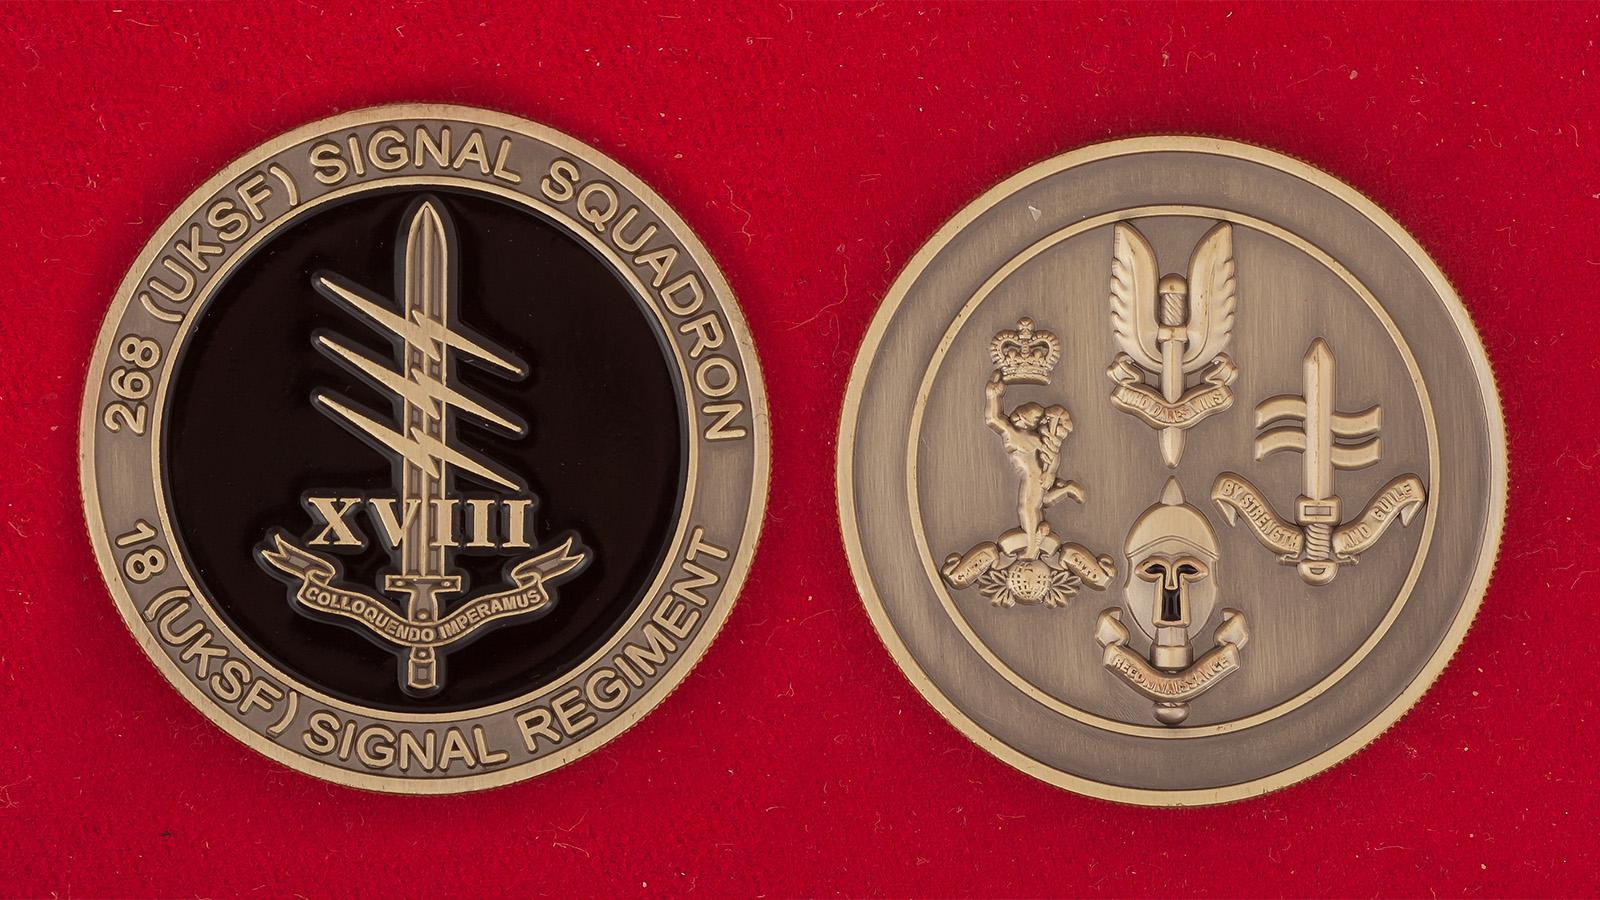 Челлендж коин 268-й роты связи 18-го полка Армии Великобритании - аверс и реверс